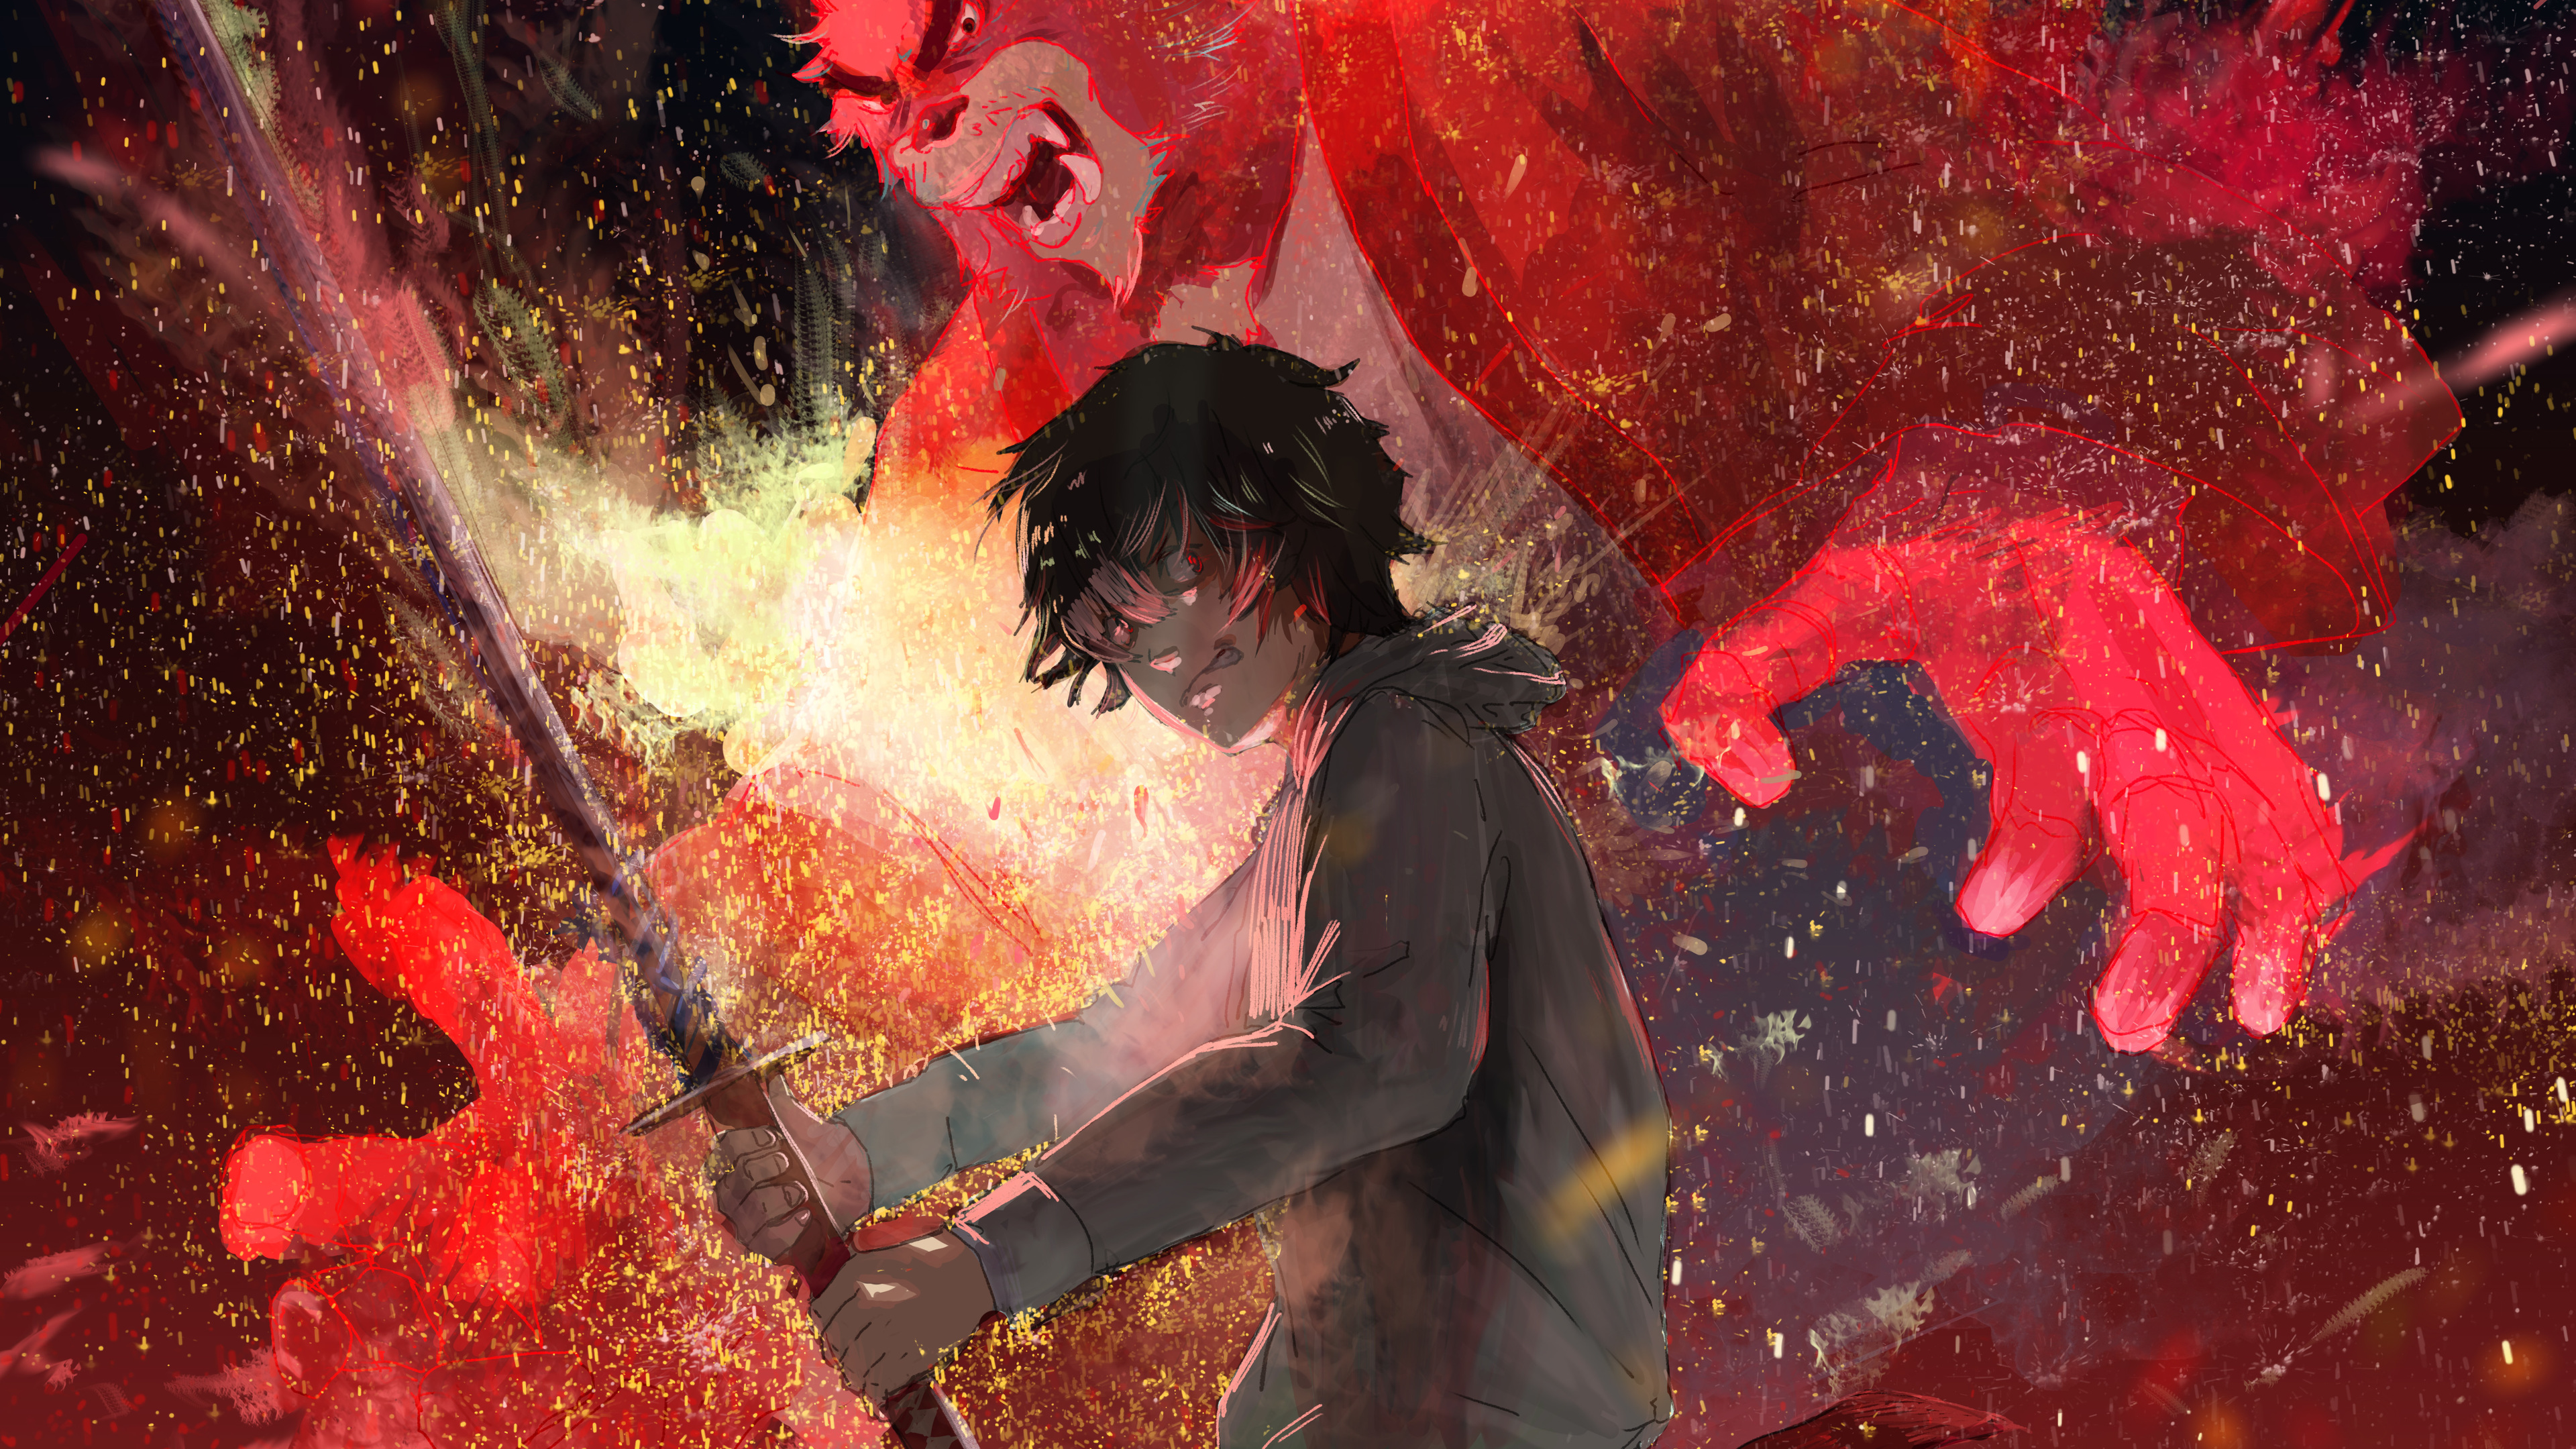 the boy and the beast anime artwork 5k 1541973715 - The Boy And The Beast Anime Artwork 5k - the boy and the beast wallpapers, hd-wallpapers, digital art wallpapers, artwork wallpapers, artist wallpapers, anime wallpapers, 5k wallpapers, 4k-wallpapers